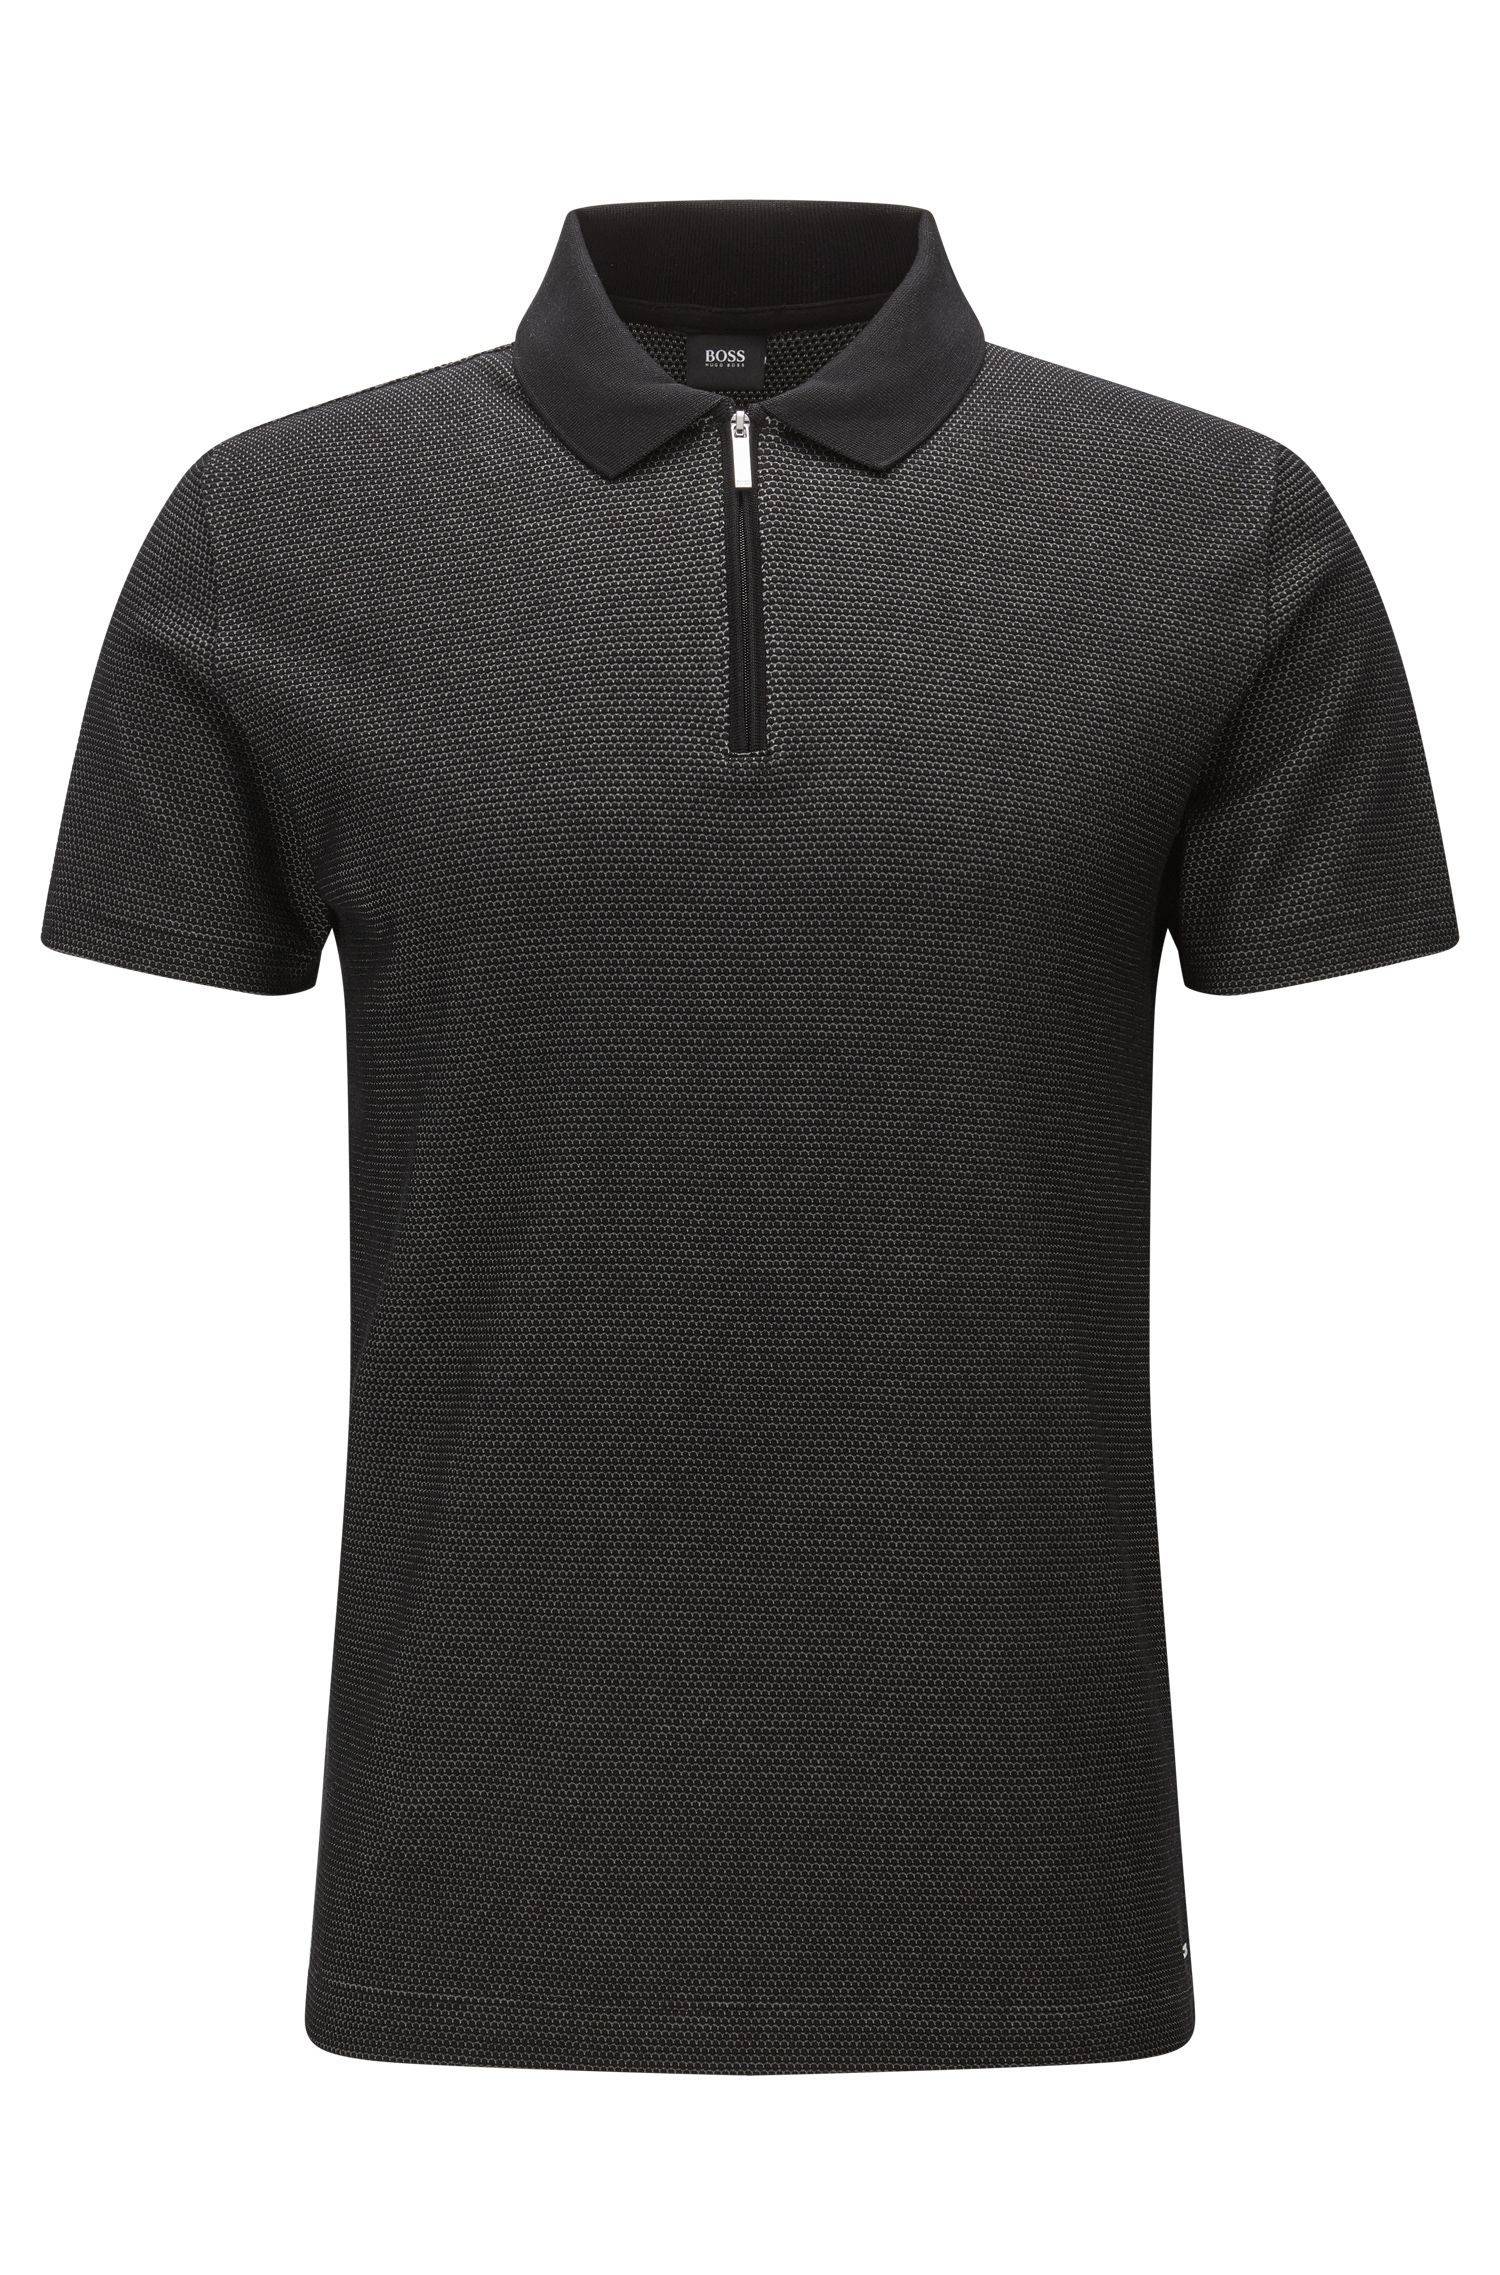 Patterned Mercerized Pima Cotton Polo Shirt, Slim Fit | Polston, Black